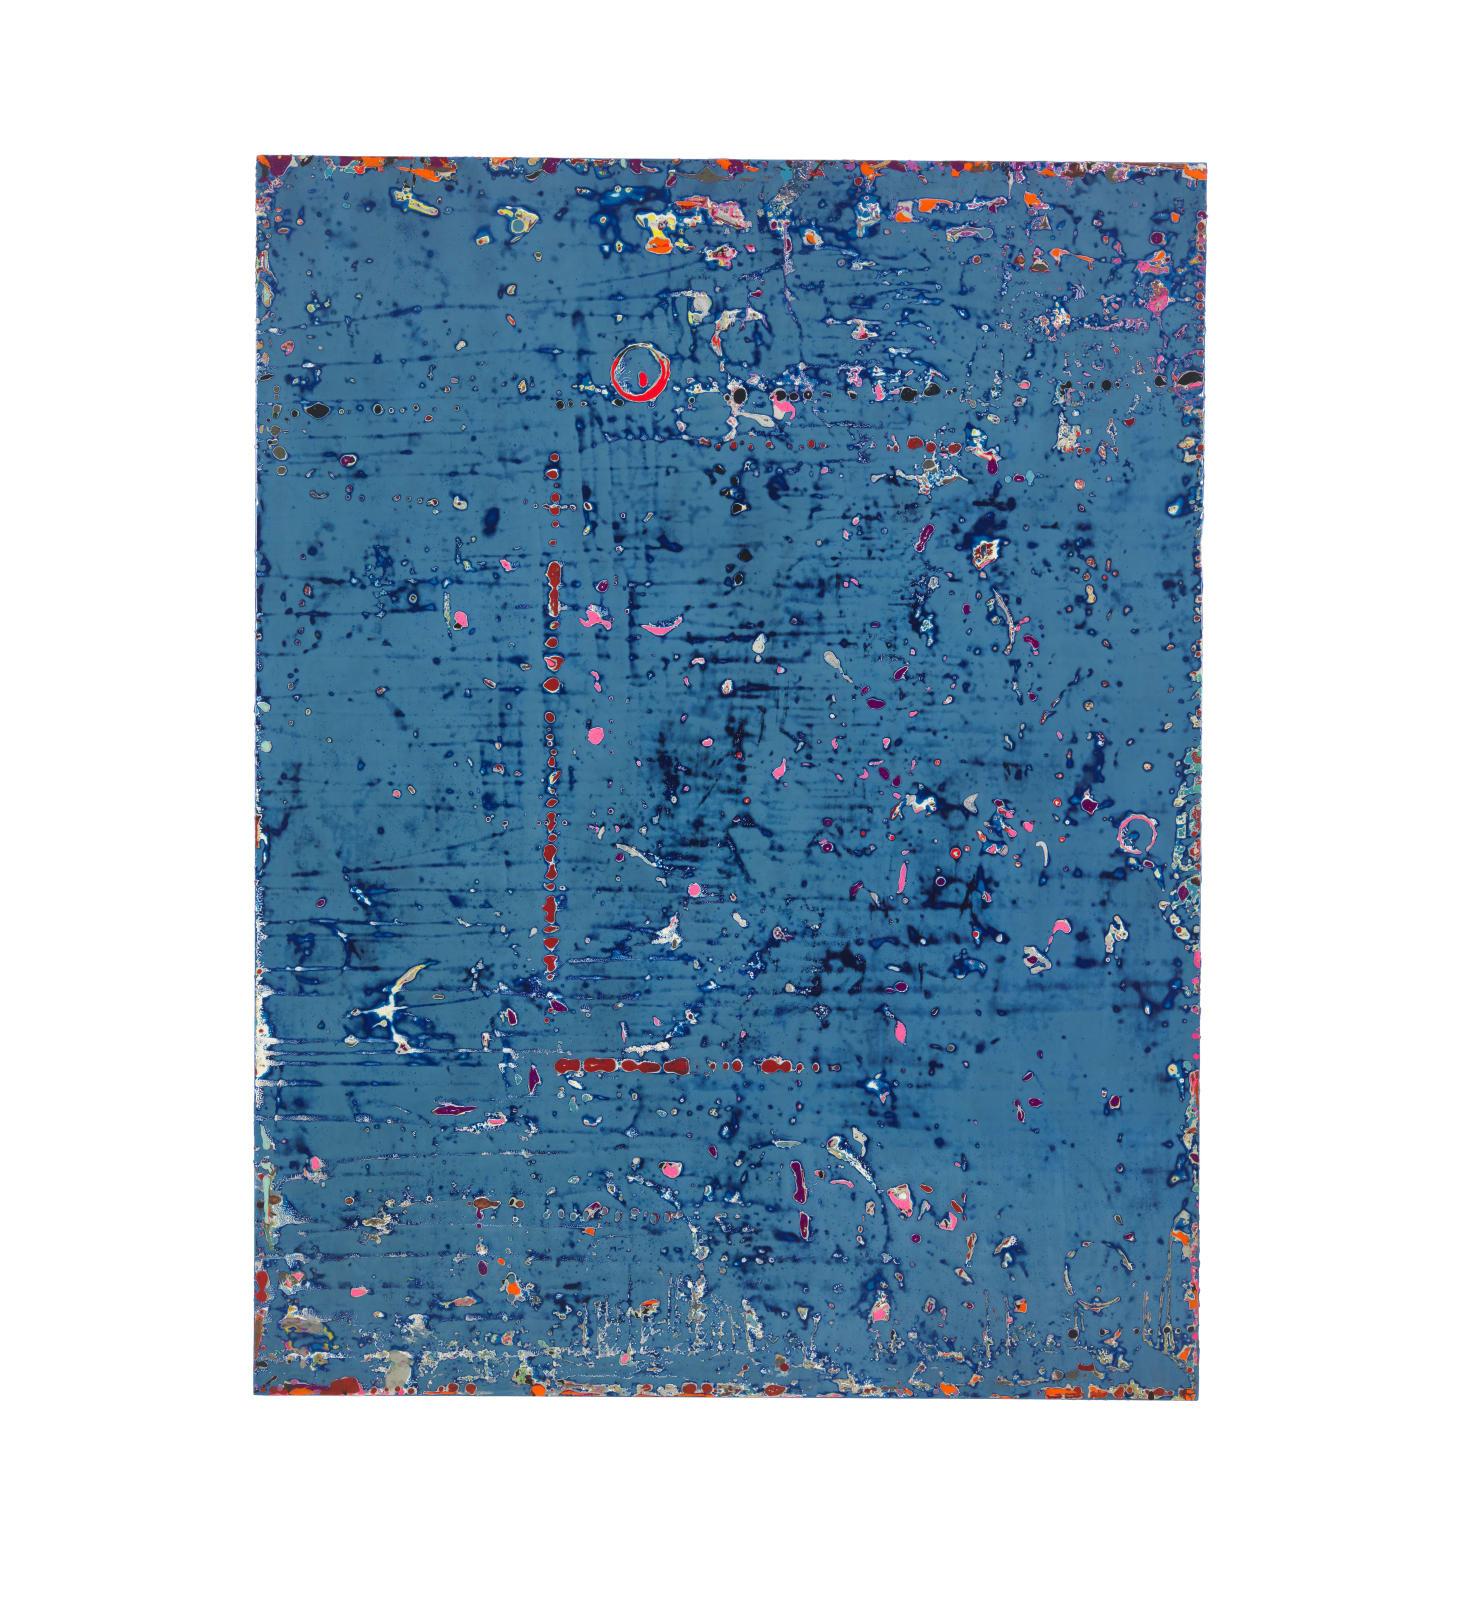 EMMANUEL BARCILON - UNTITLED - 2016 - VARNISH AND PIGMENT ON WOOD - 200 X 153 CM